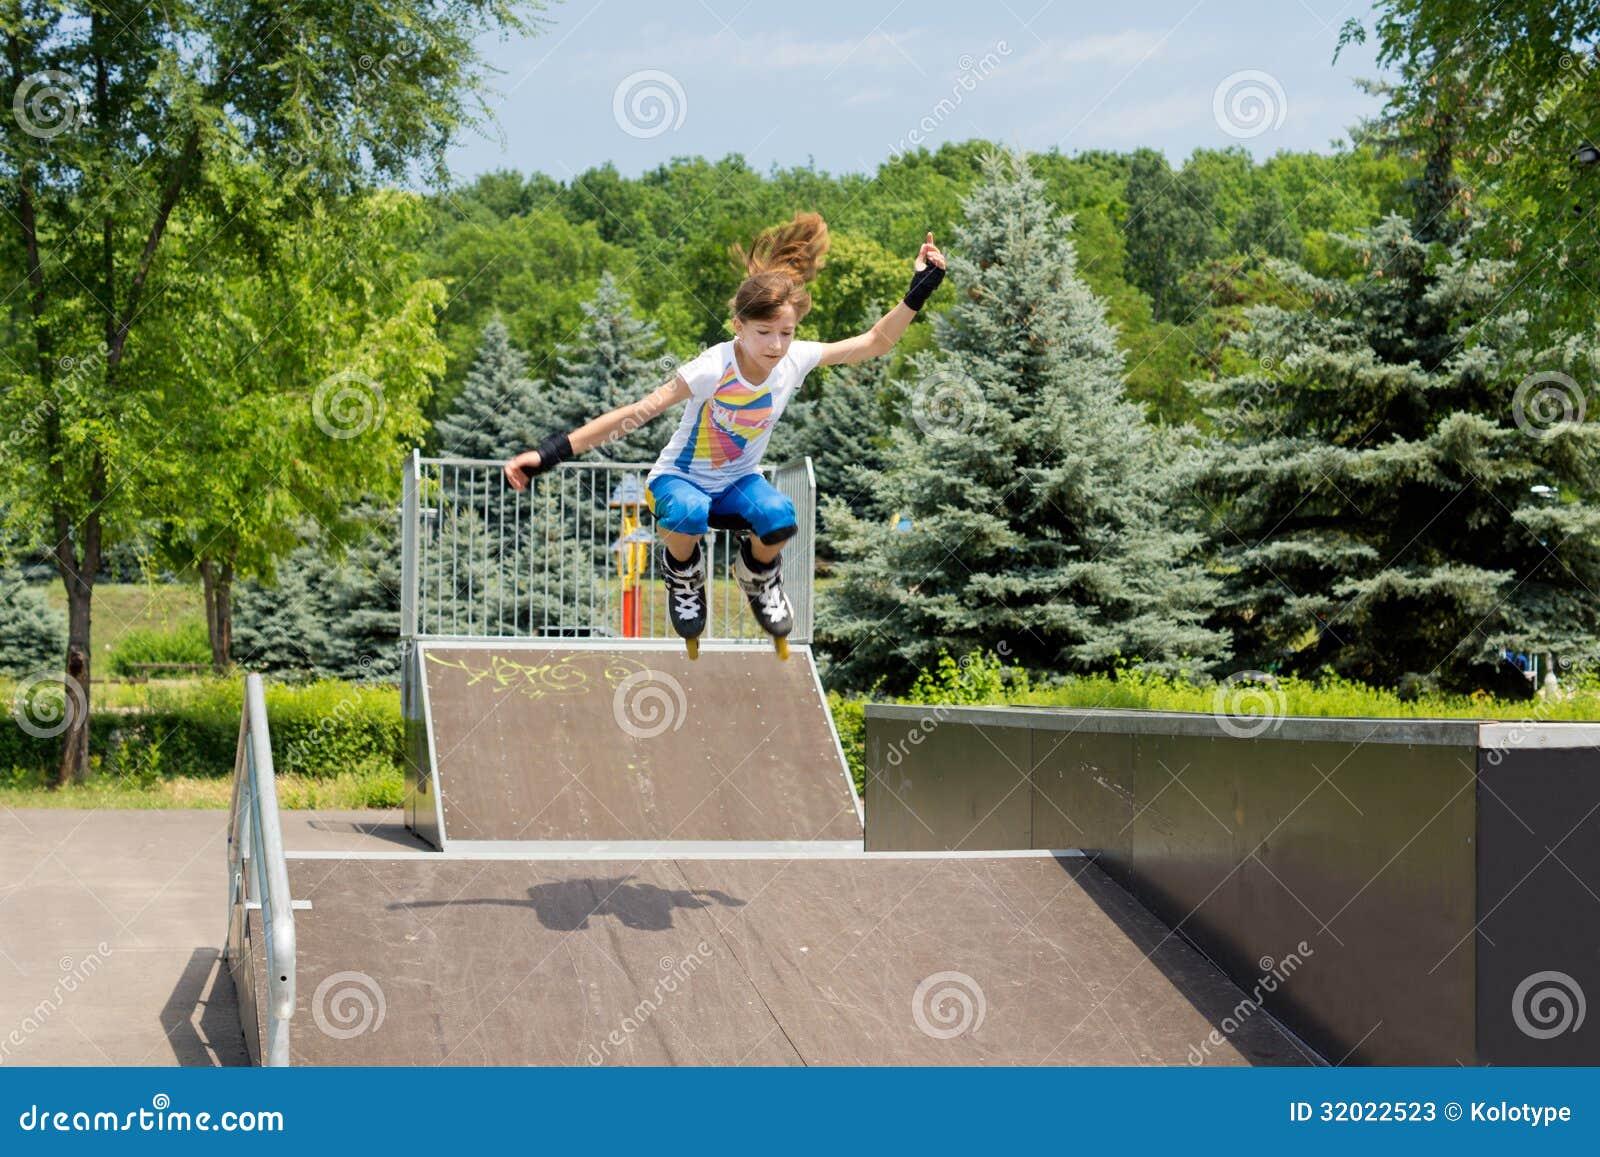 Skate park business plan